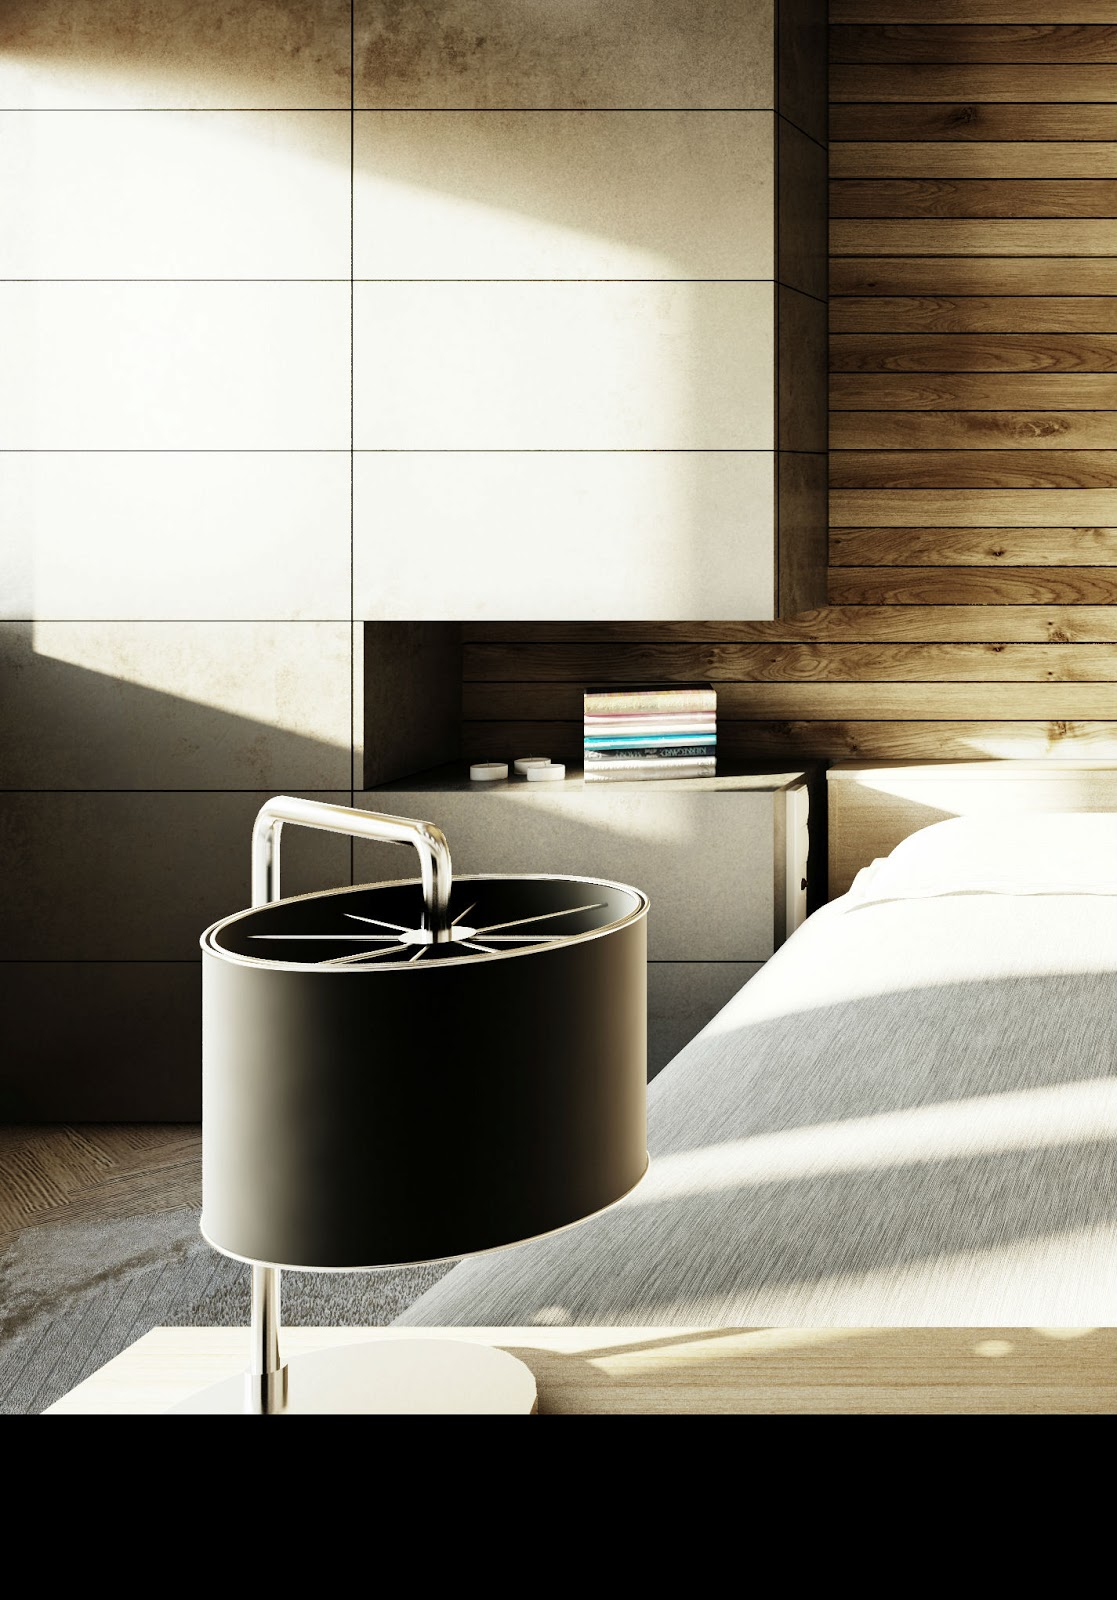 Propunere de amenjare dormitor 4